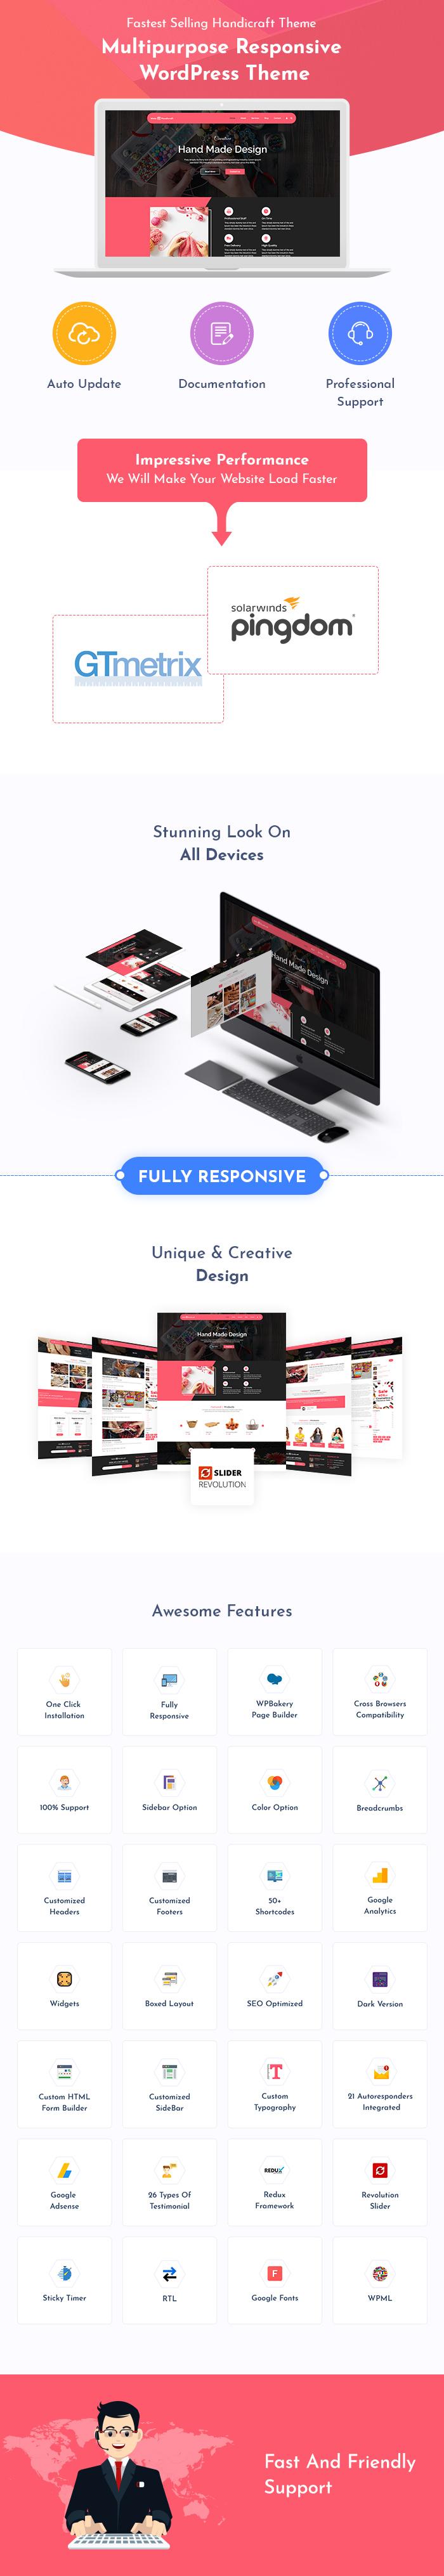 Handicraft WordPress Themes